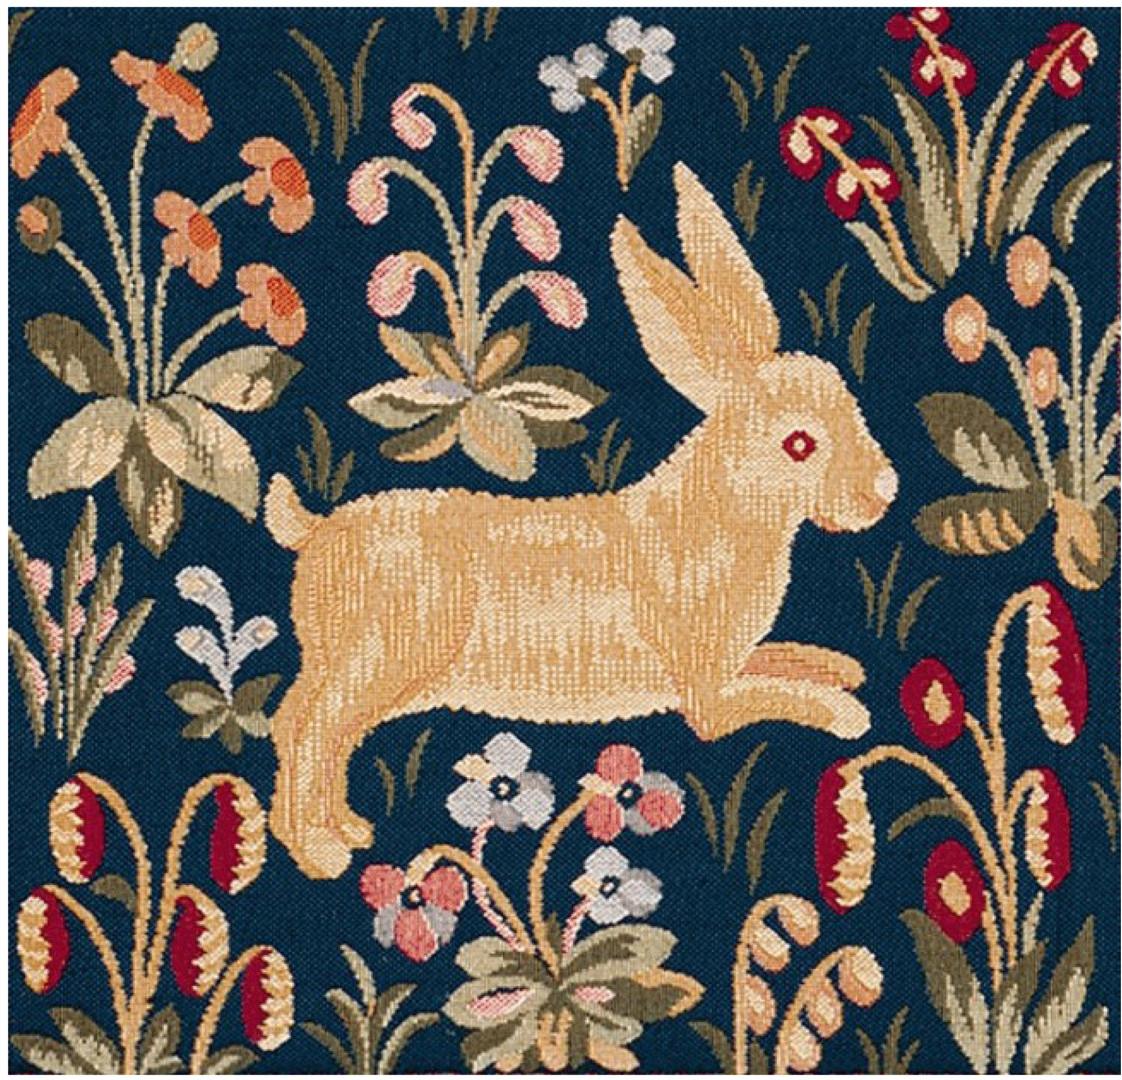 Medieval Rabbit Running European Cushion